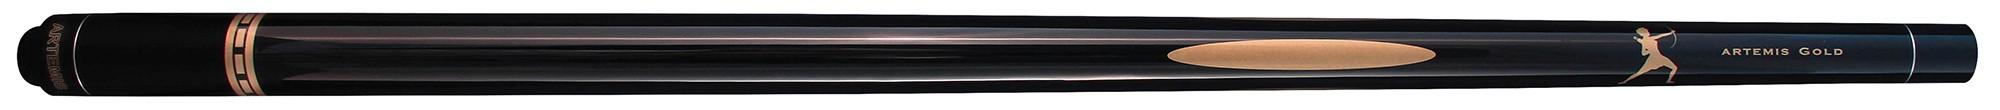 Artemis Mister 100® Black/Gold Special edition